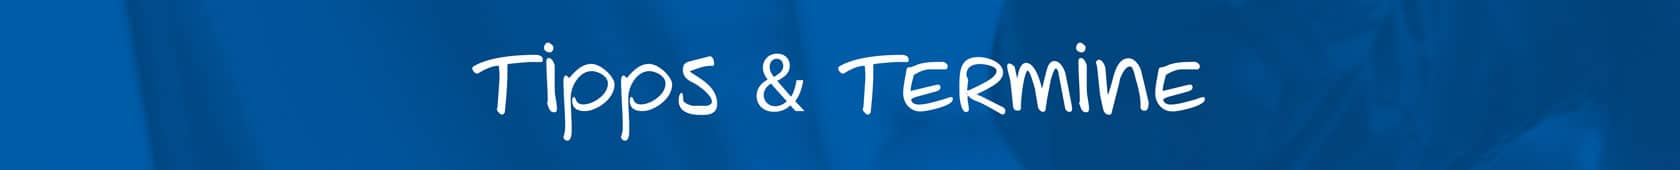 Tipps & Termine